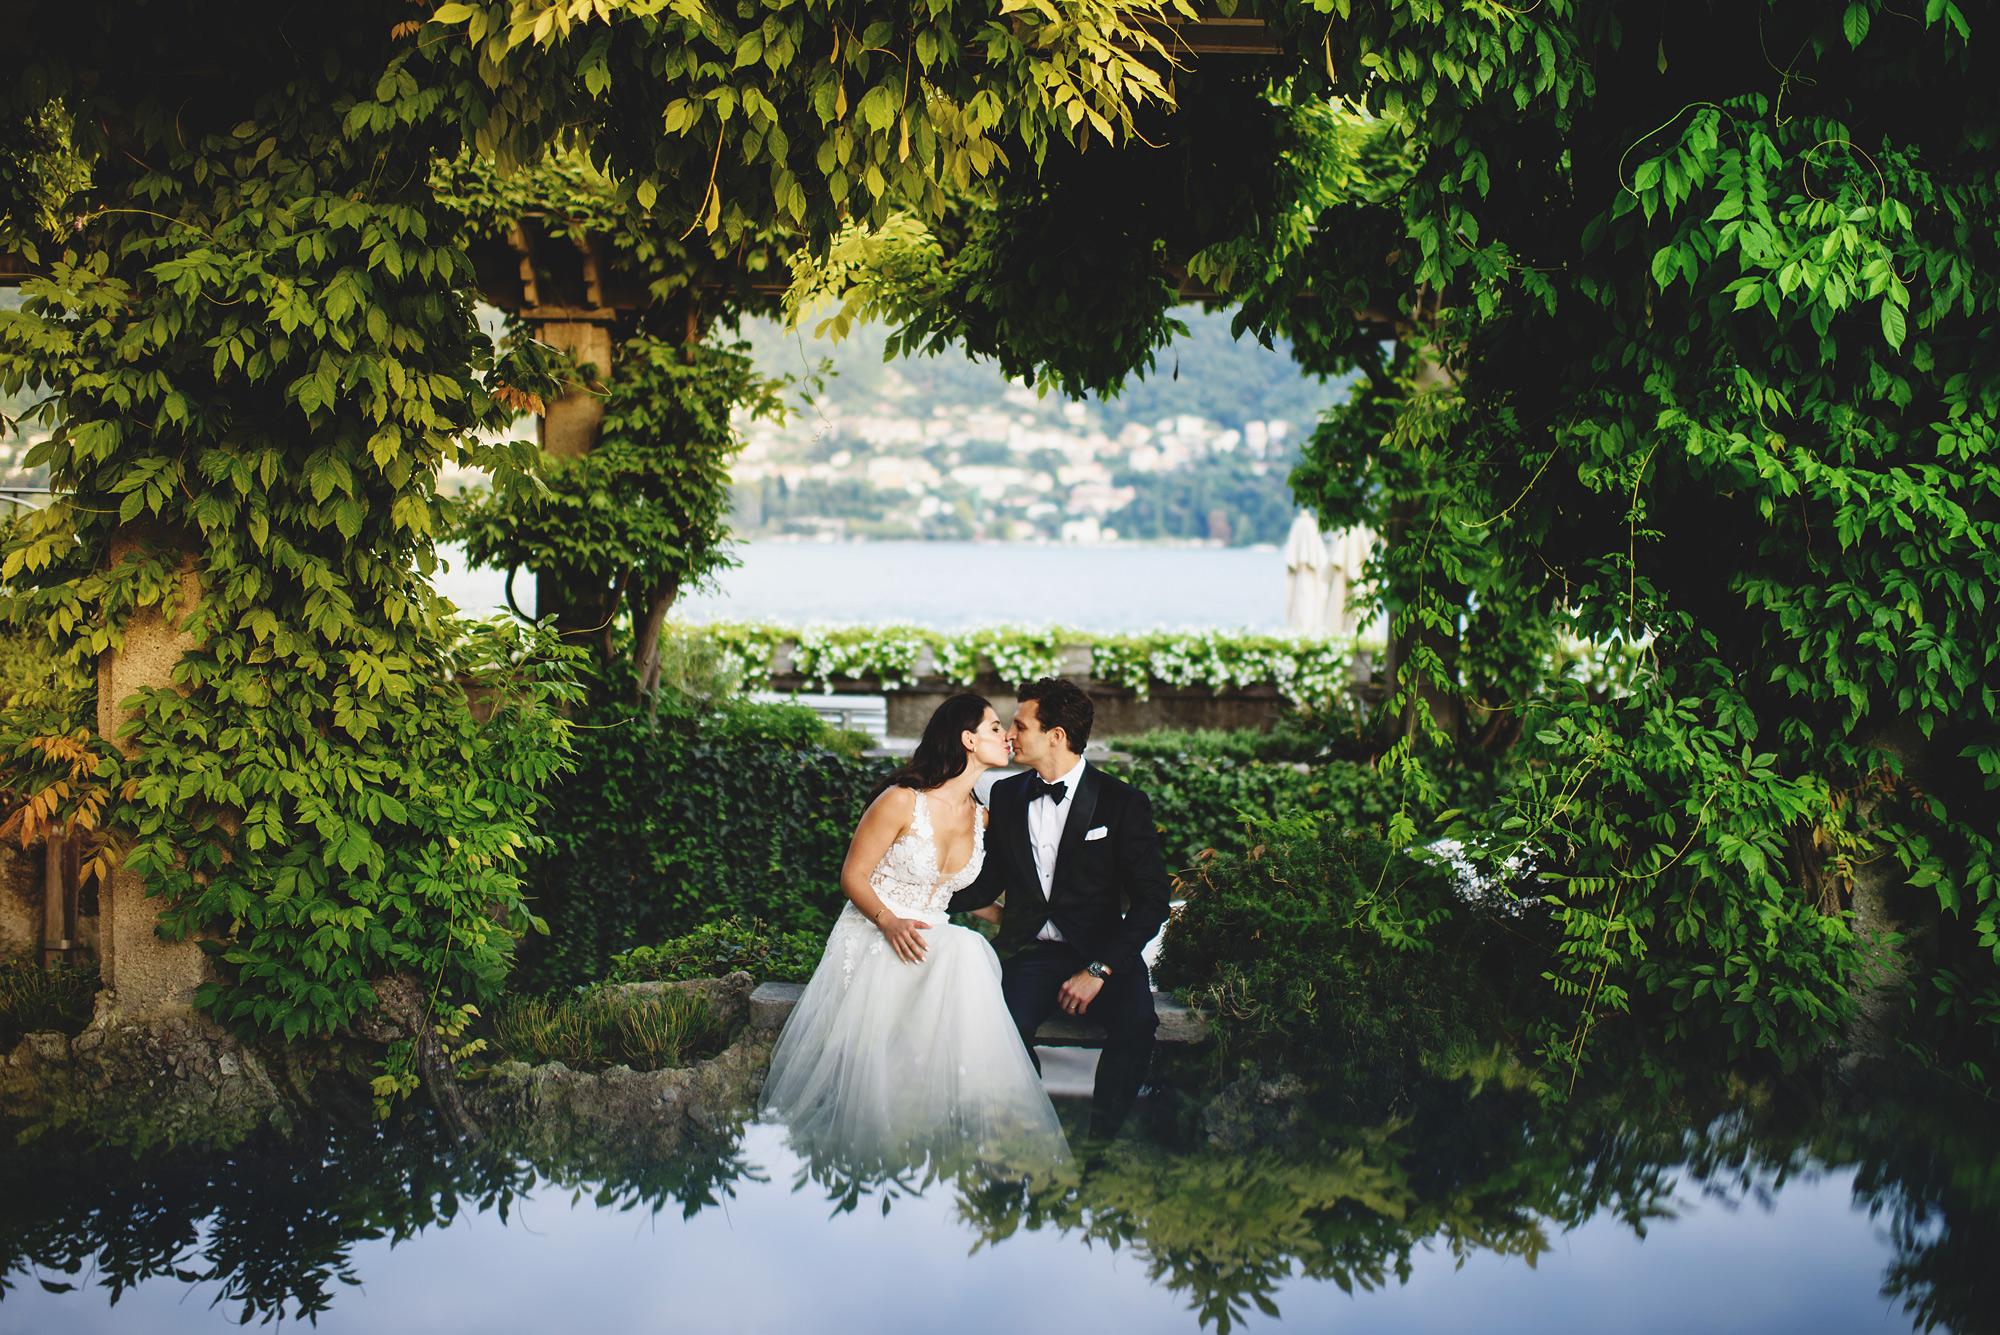 reflection-couple-at-lake-como-under-spring-wisteria-vines-worlds-best-wedding-photos-ross-harvey-london-wedding-photographers